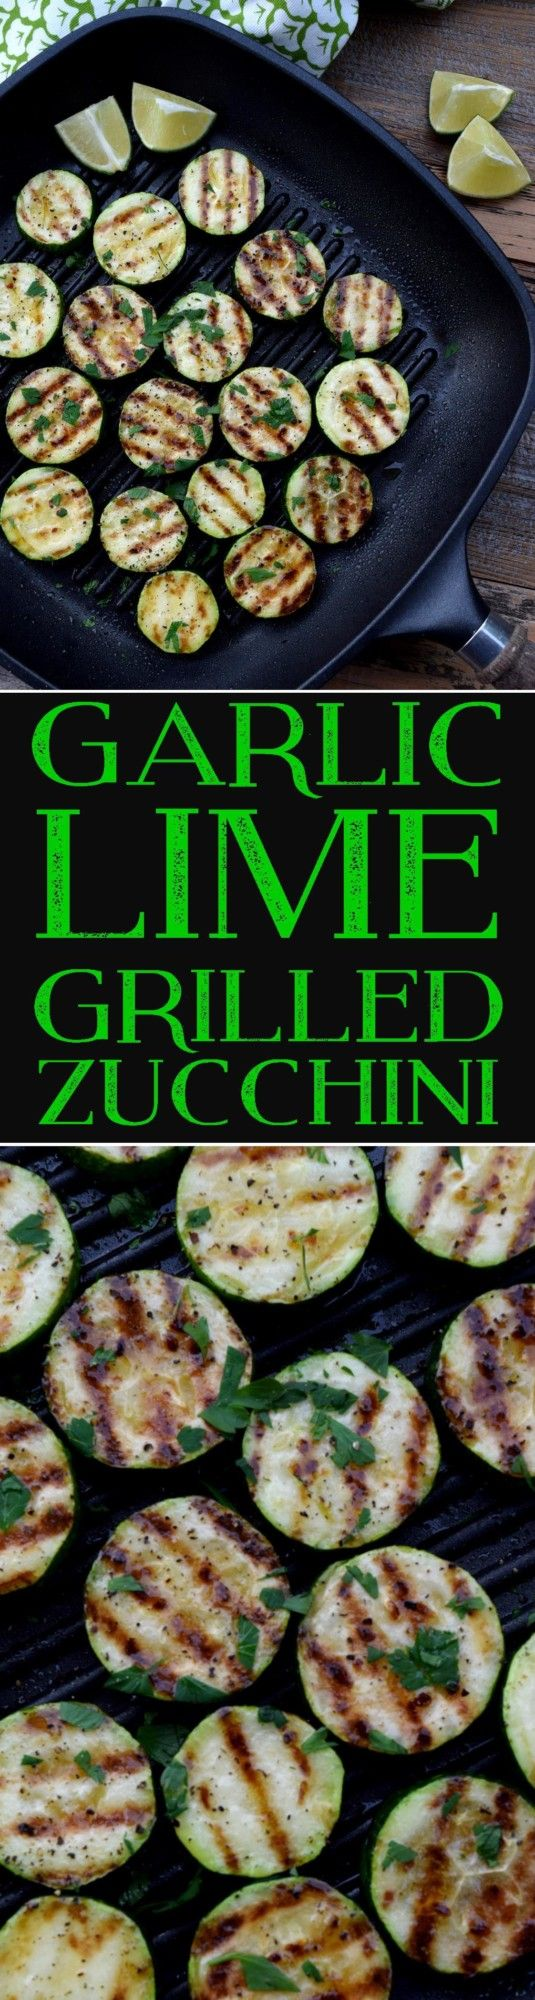 Garlic Lime Grilled Zucchini